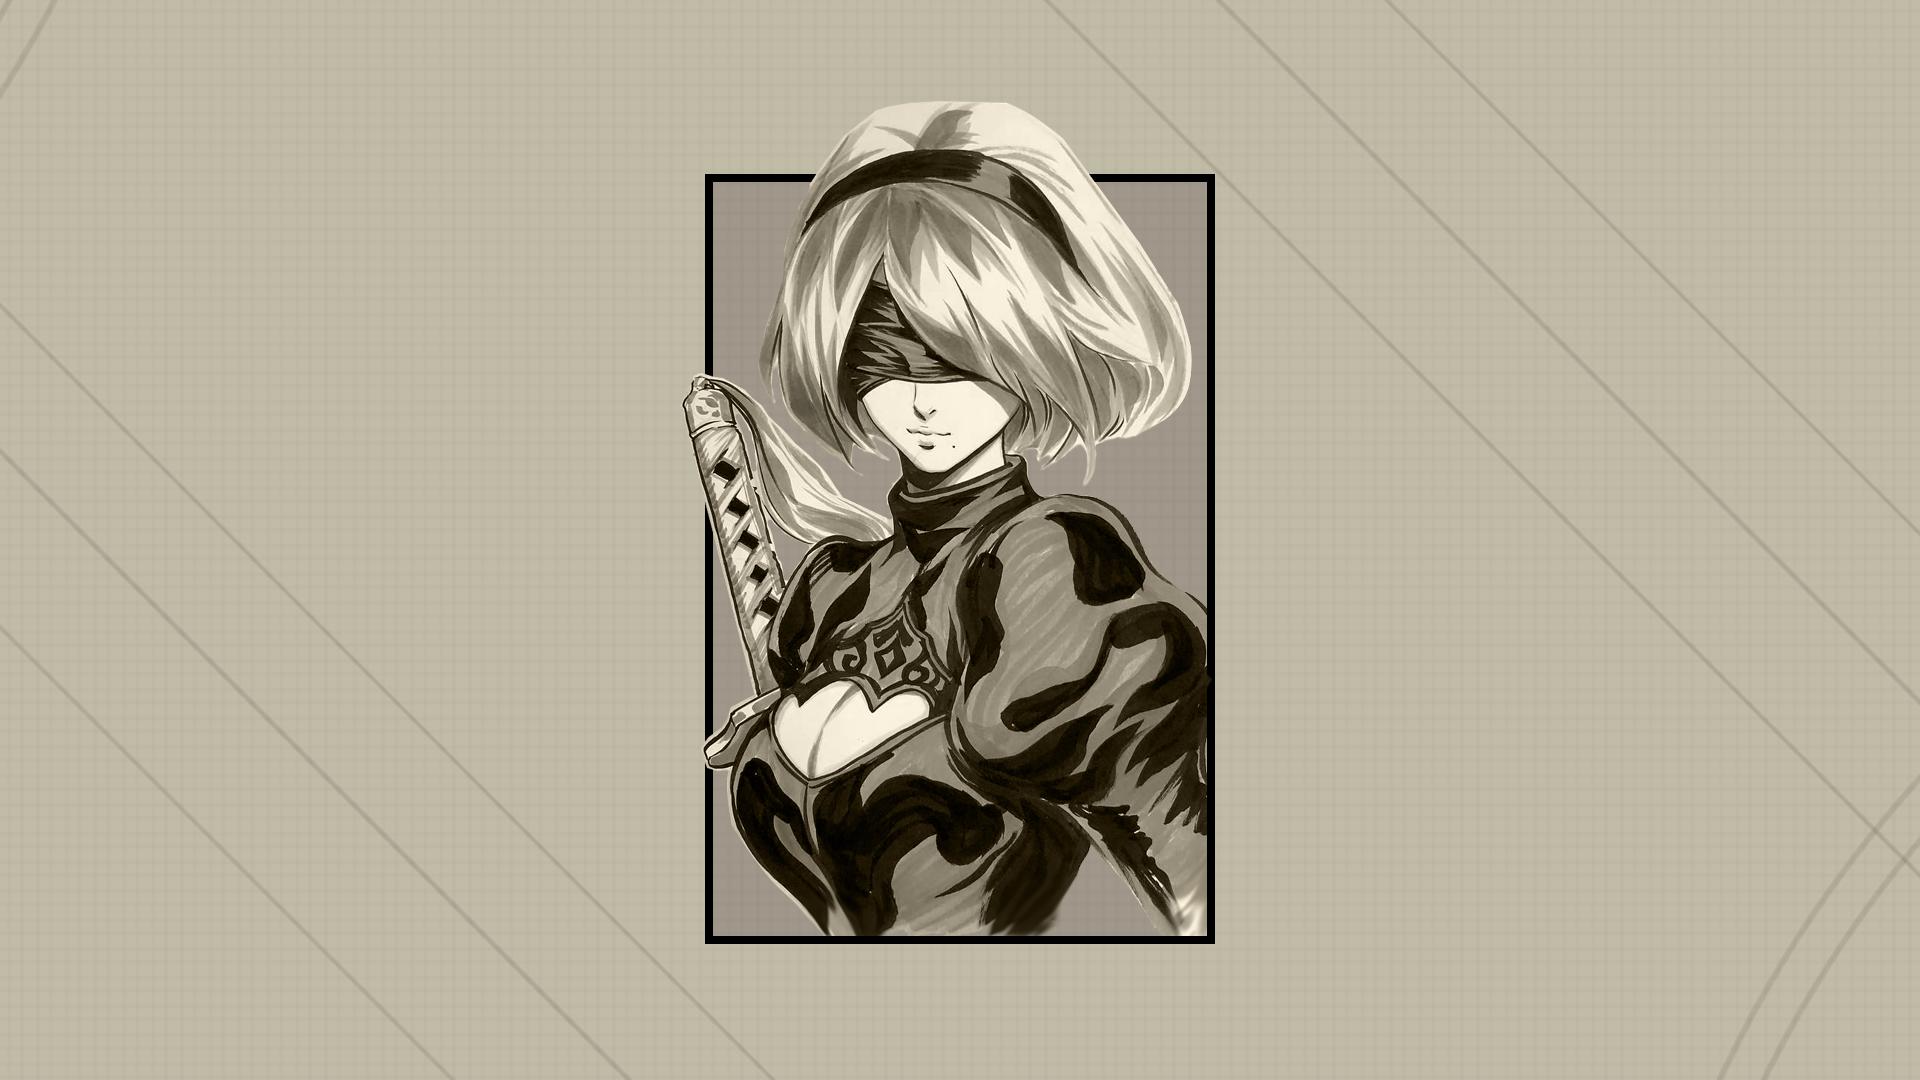 Anime 1920x1080 Nier: Automata 2B (Nier: Automata) render in shapes